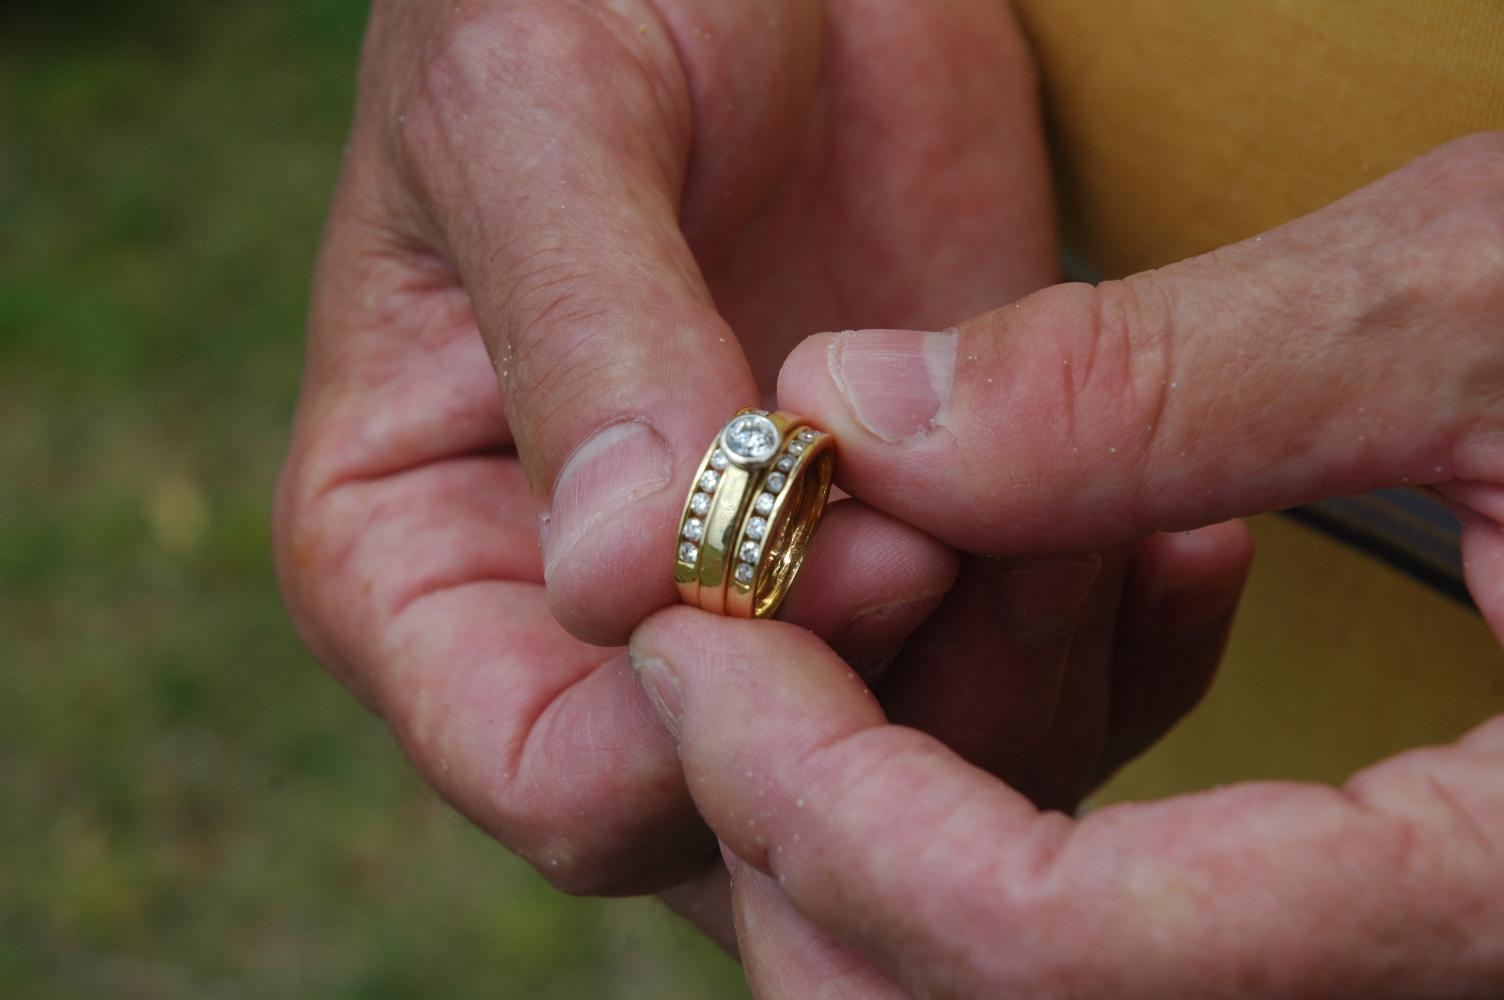 allisons lost wedding ring from rockingham beach - Lost Wedding Ring